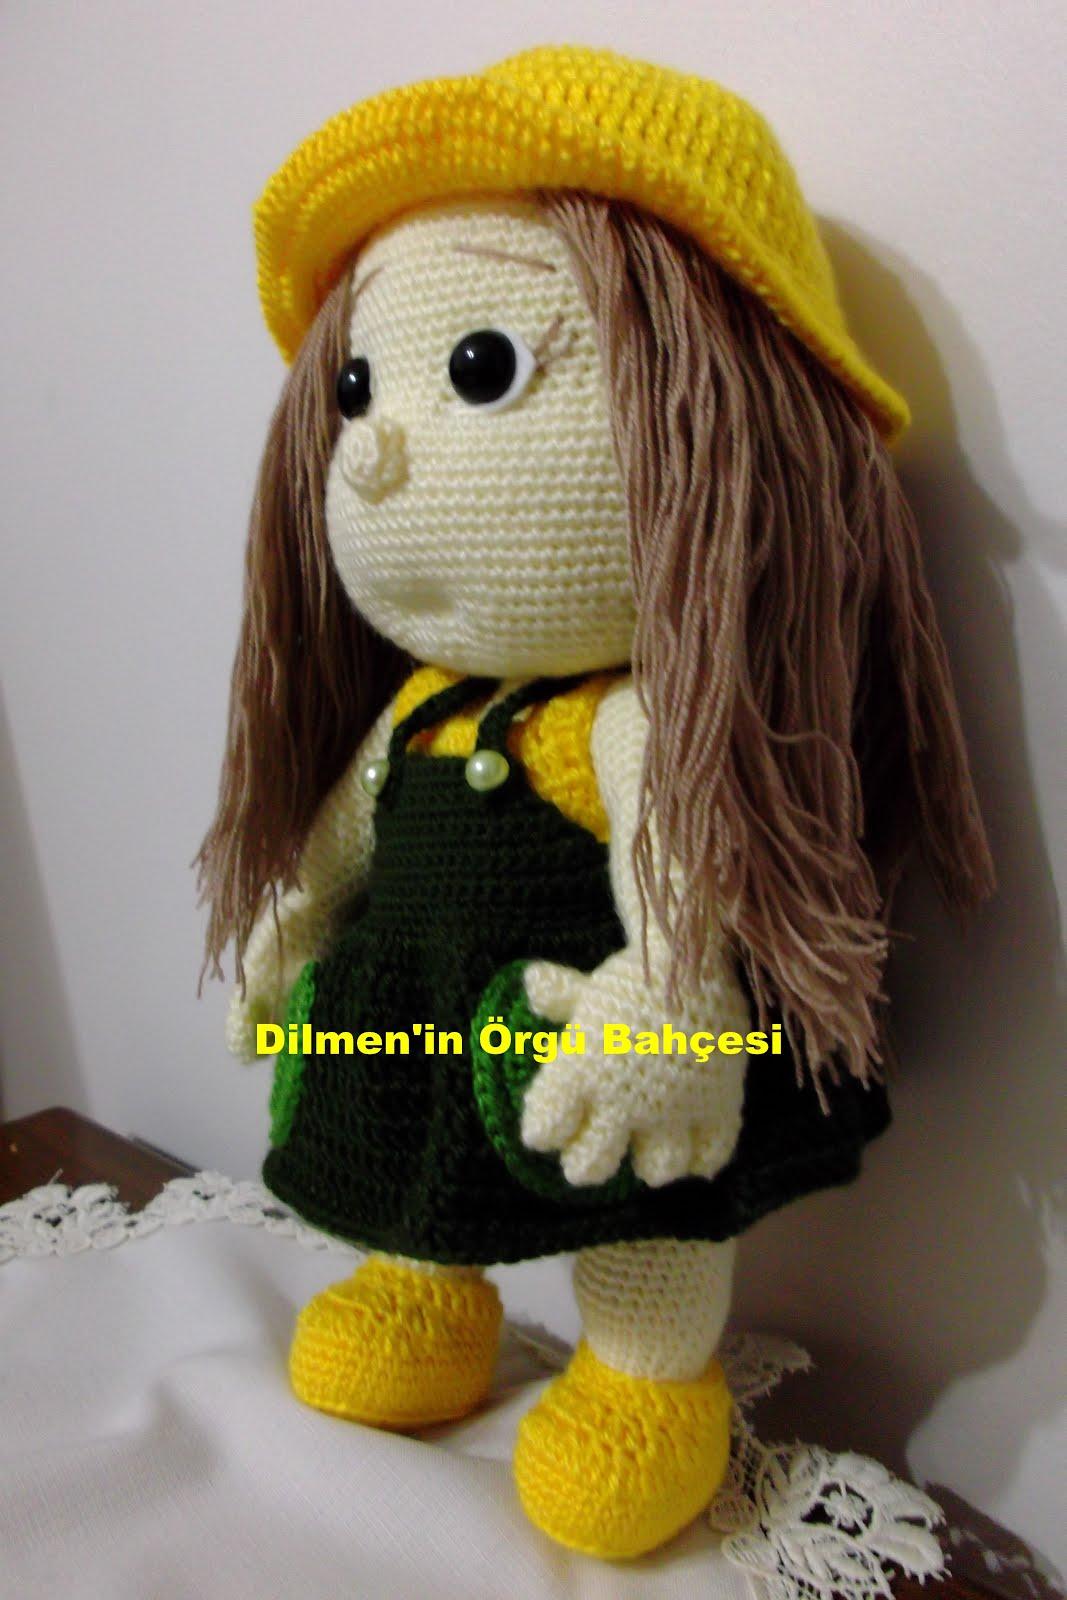 Doll crochet # Part 1 - YouTube | 1600x1067